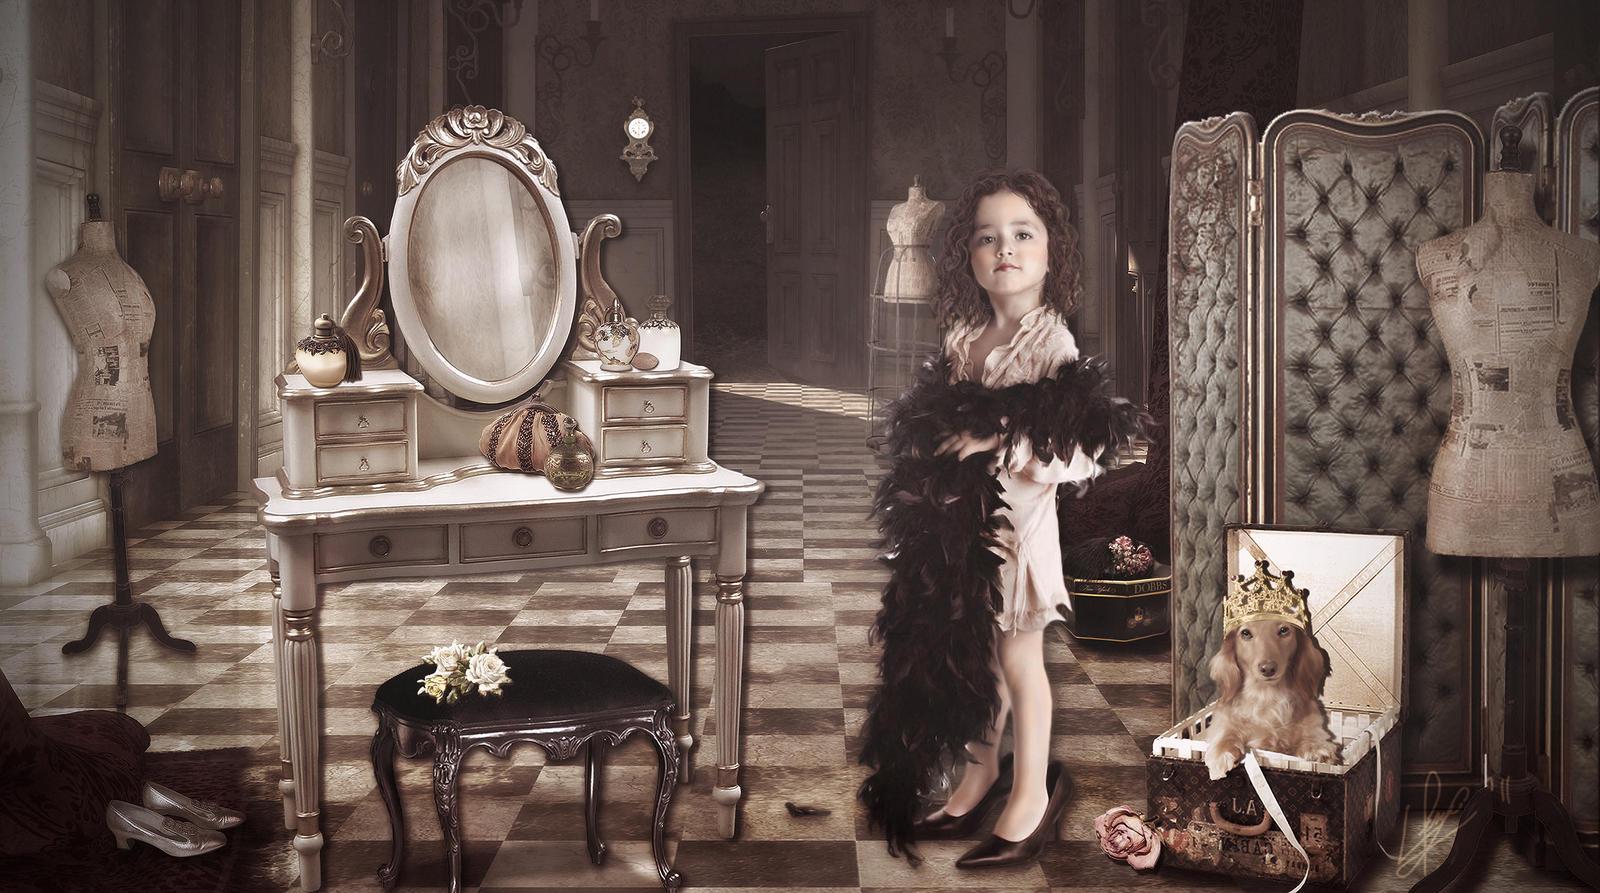 Alexia\'s Dressing Room by Capricuario on DeviantArt